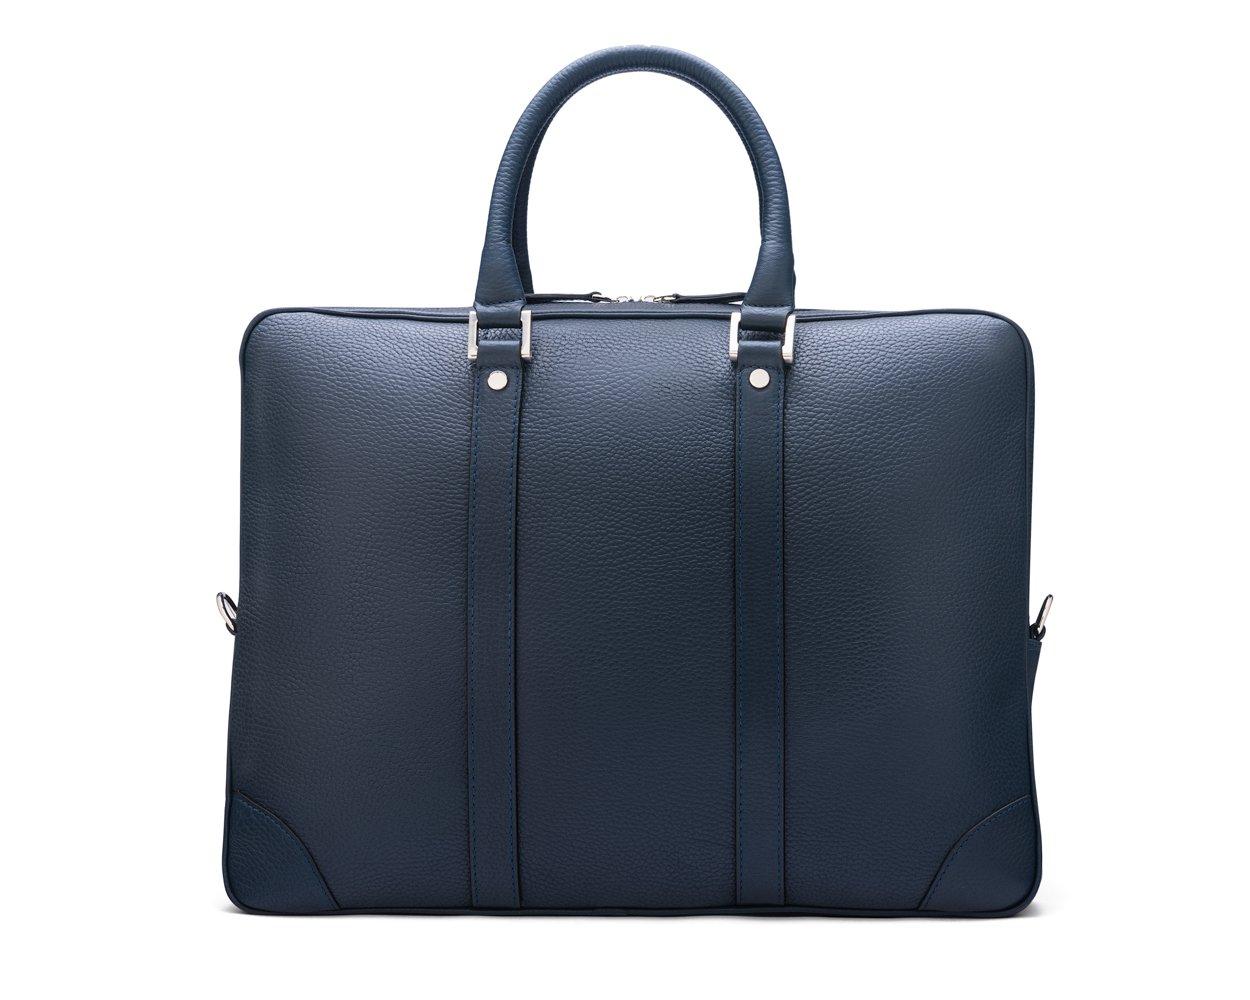 SAGEBROWN Navy Gainsborough Laptop Bag